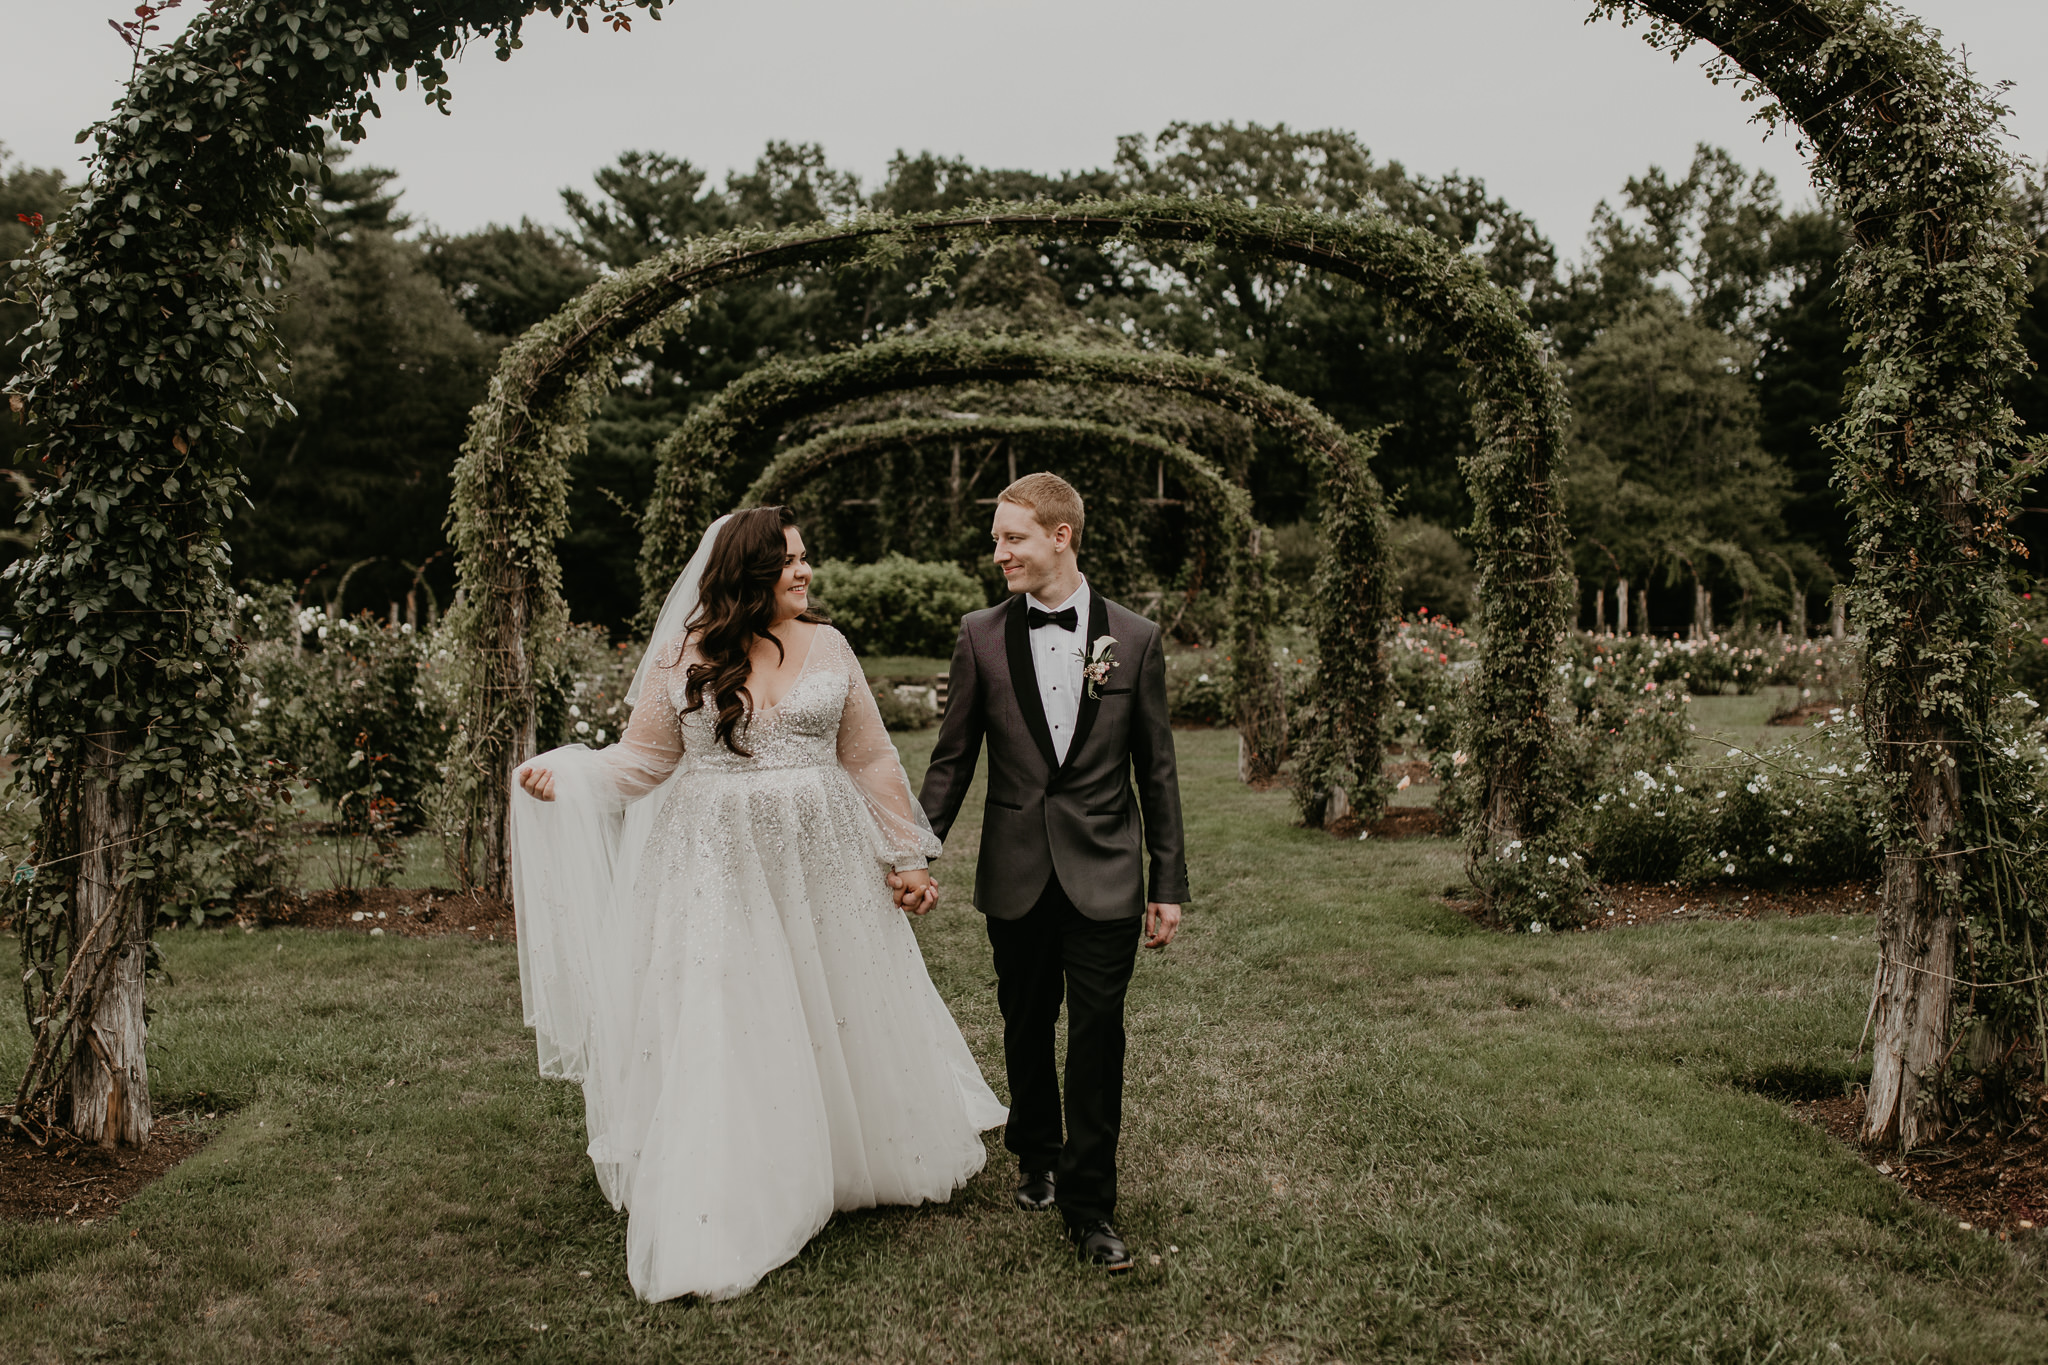 H+A_Hartford_Connecticut_RoseGarden_Wedding036.jpg